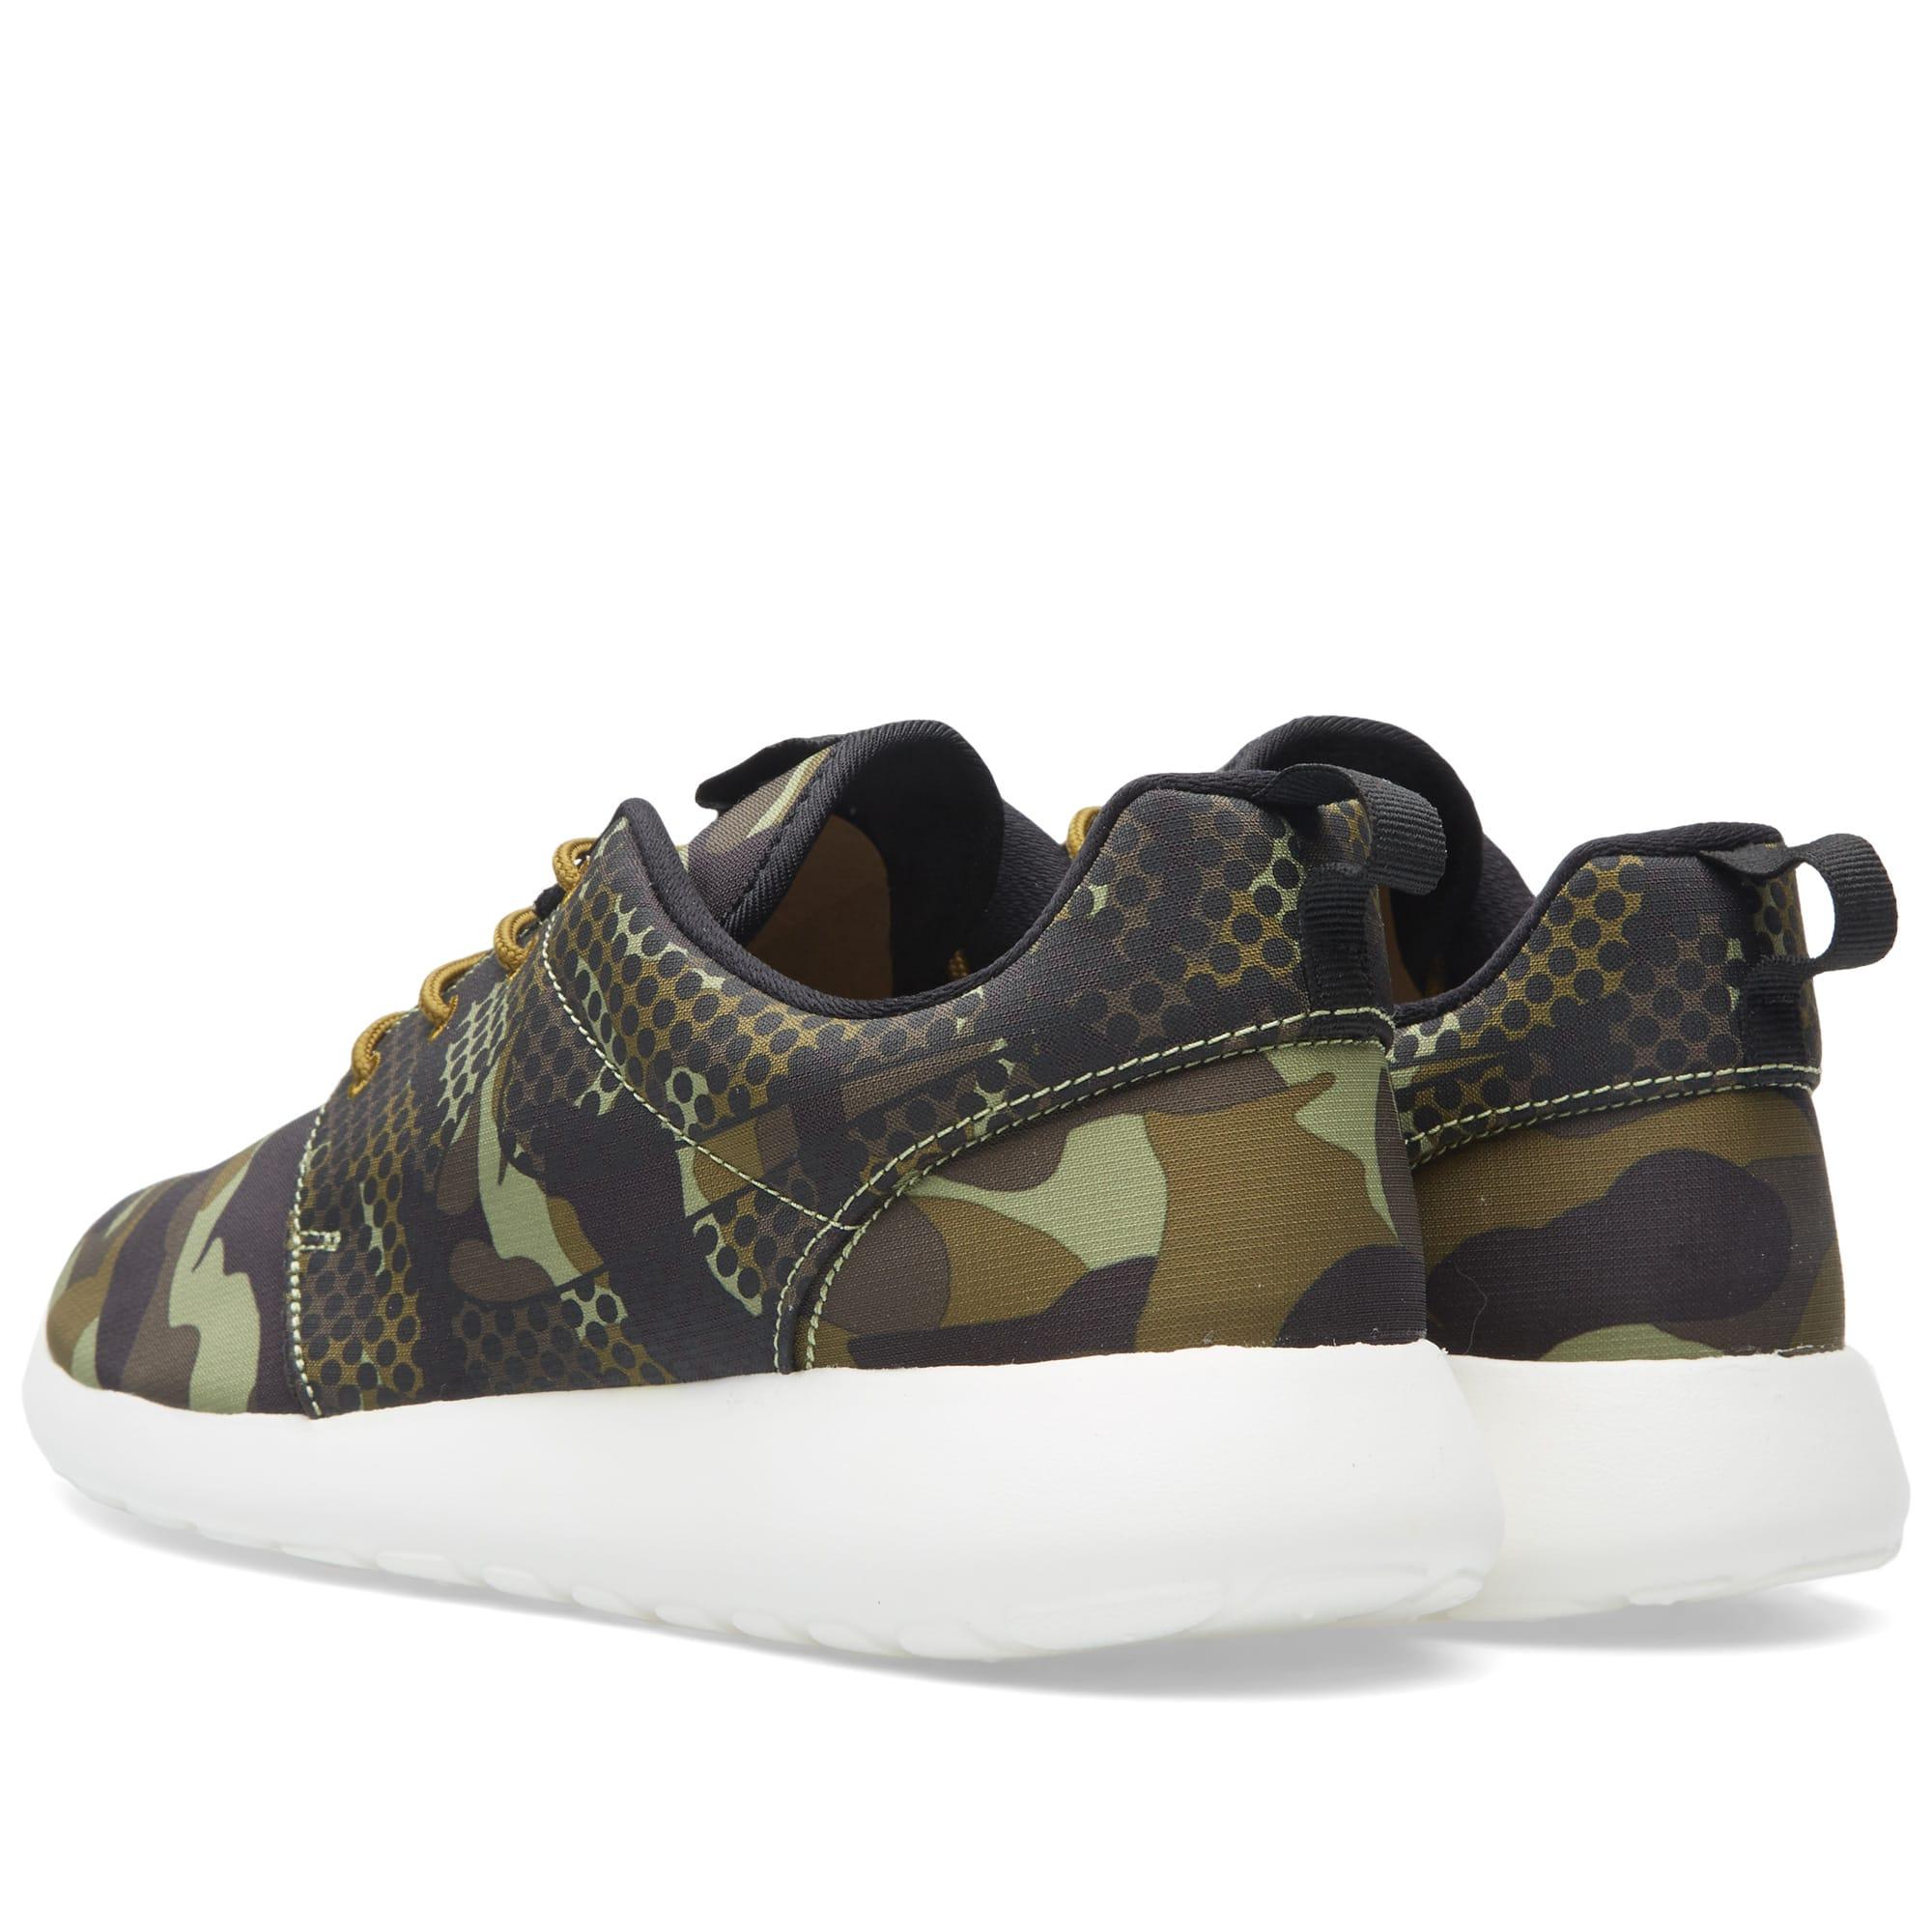 best sneakers 265ac 6a480 ... purchase nike crocodile sneakers e032f a4654